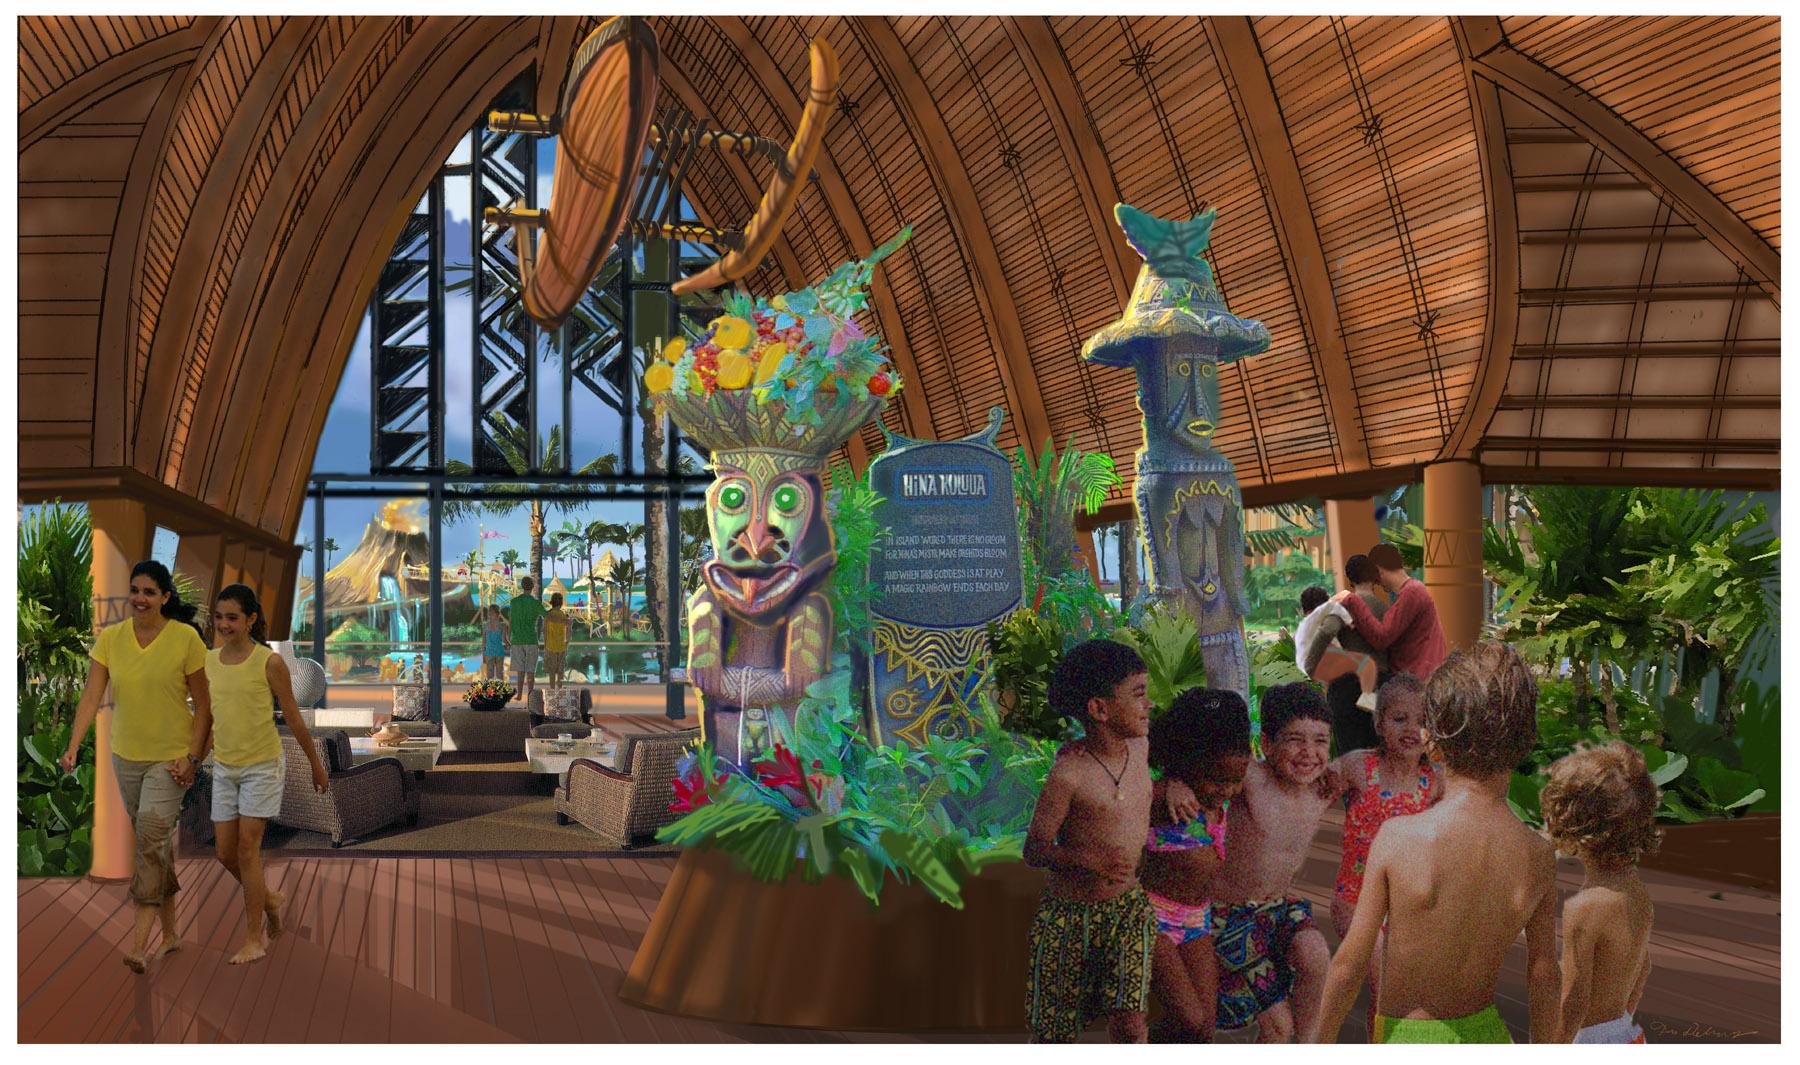 Disney's Aulani Resort Lobby Concept